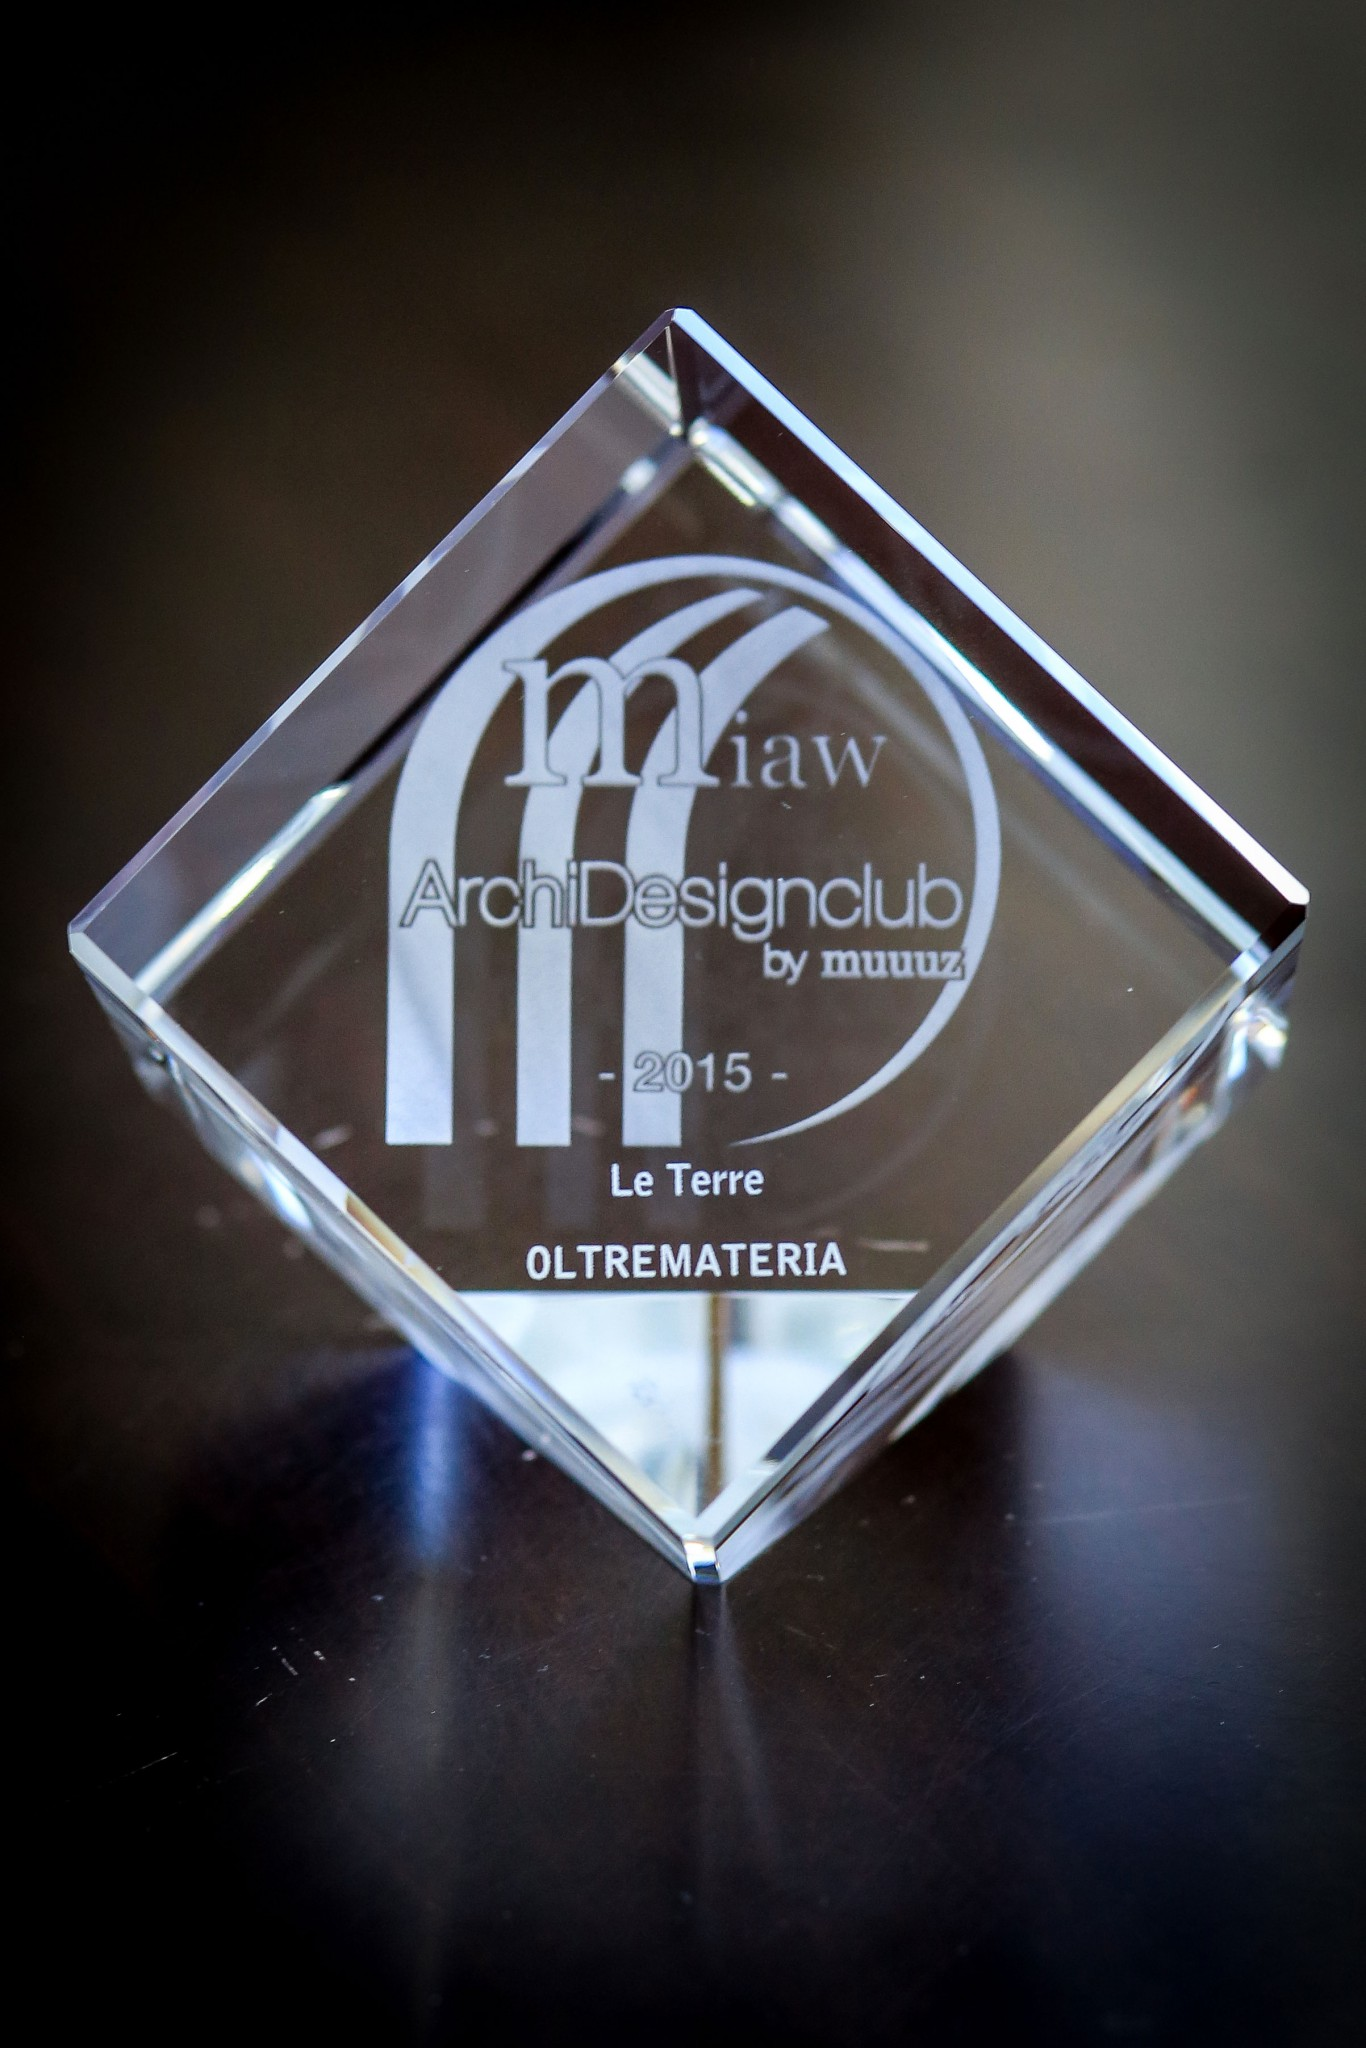 Muuuz International Awards 2015